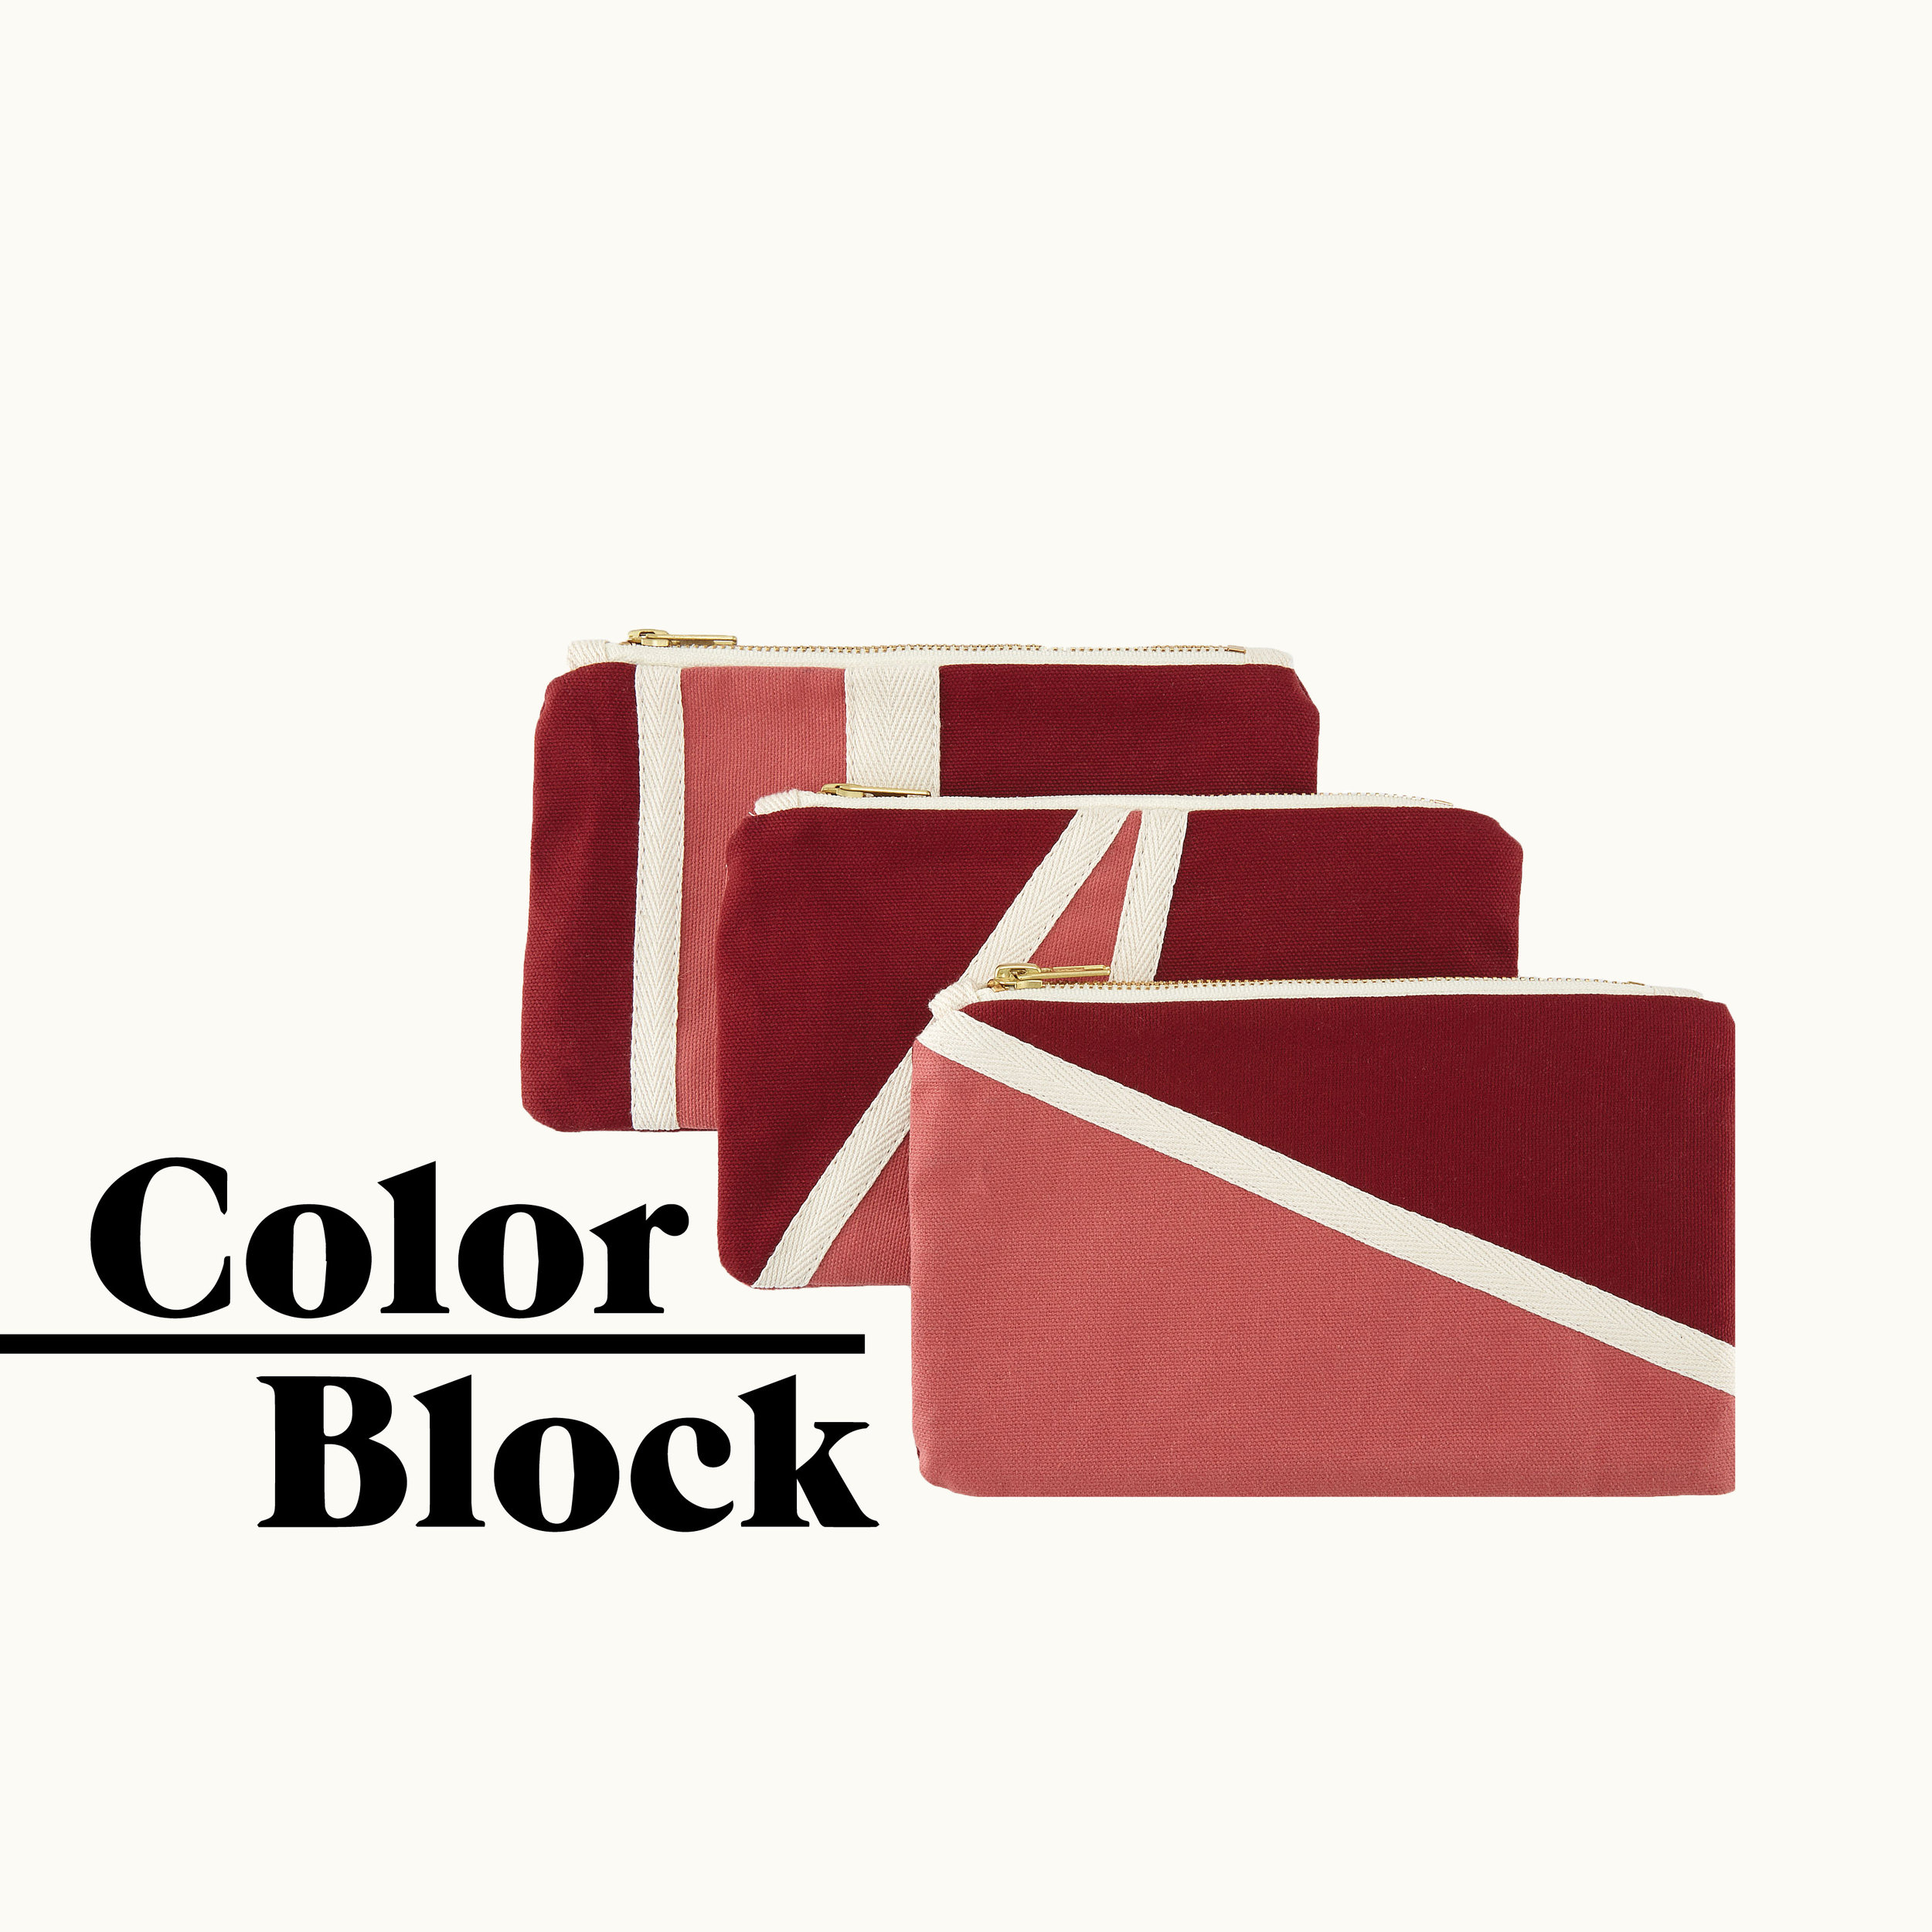 colorblock.jpg